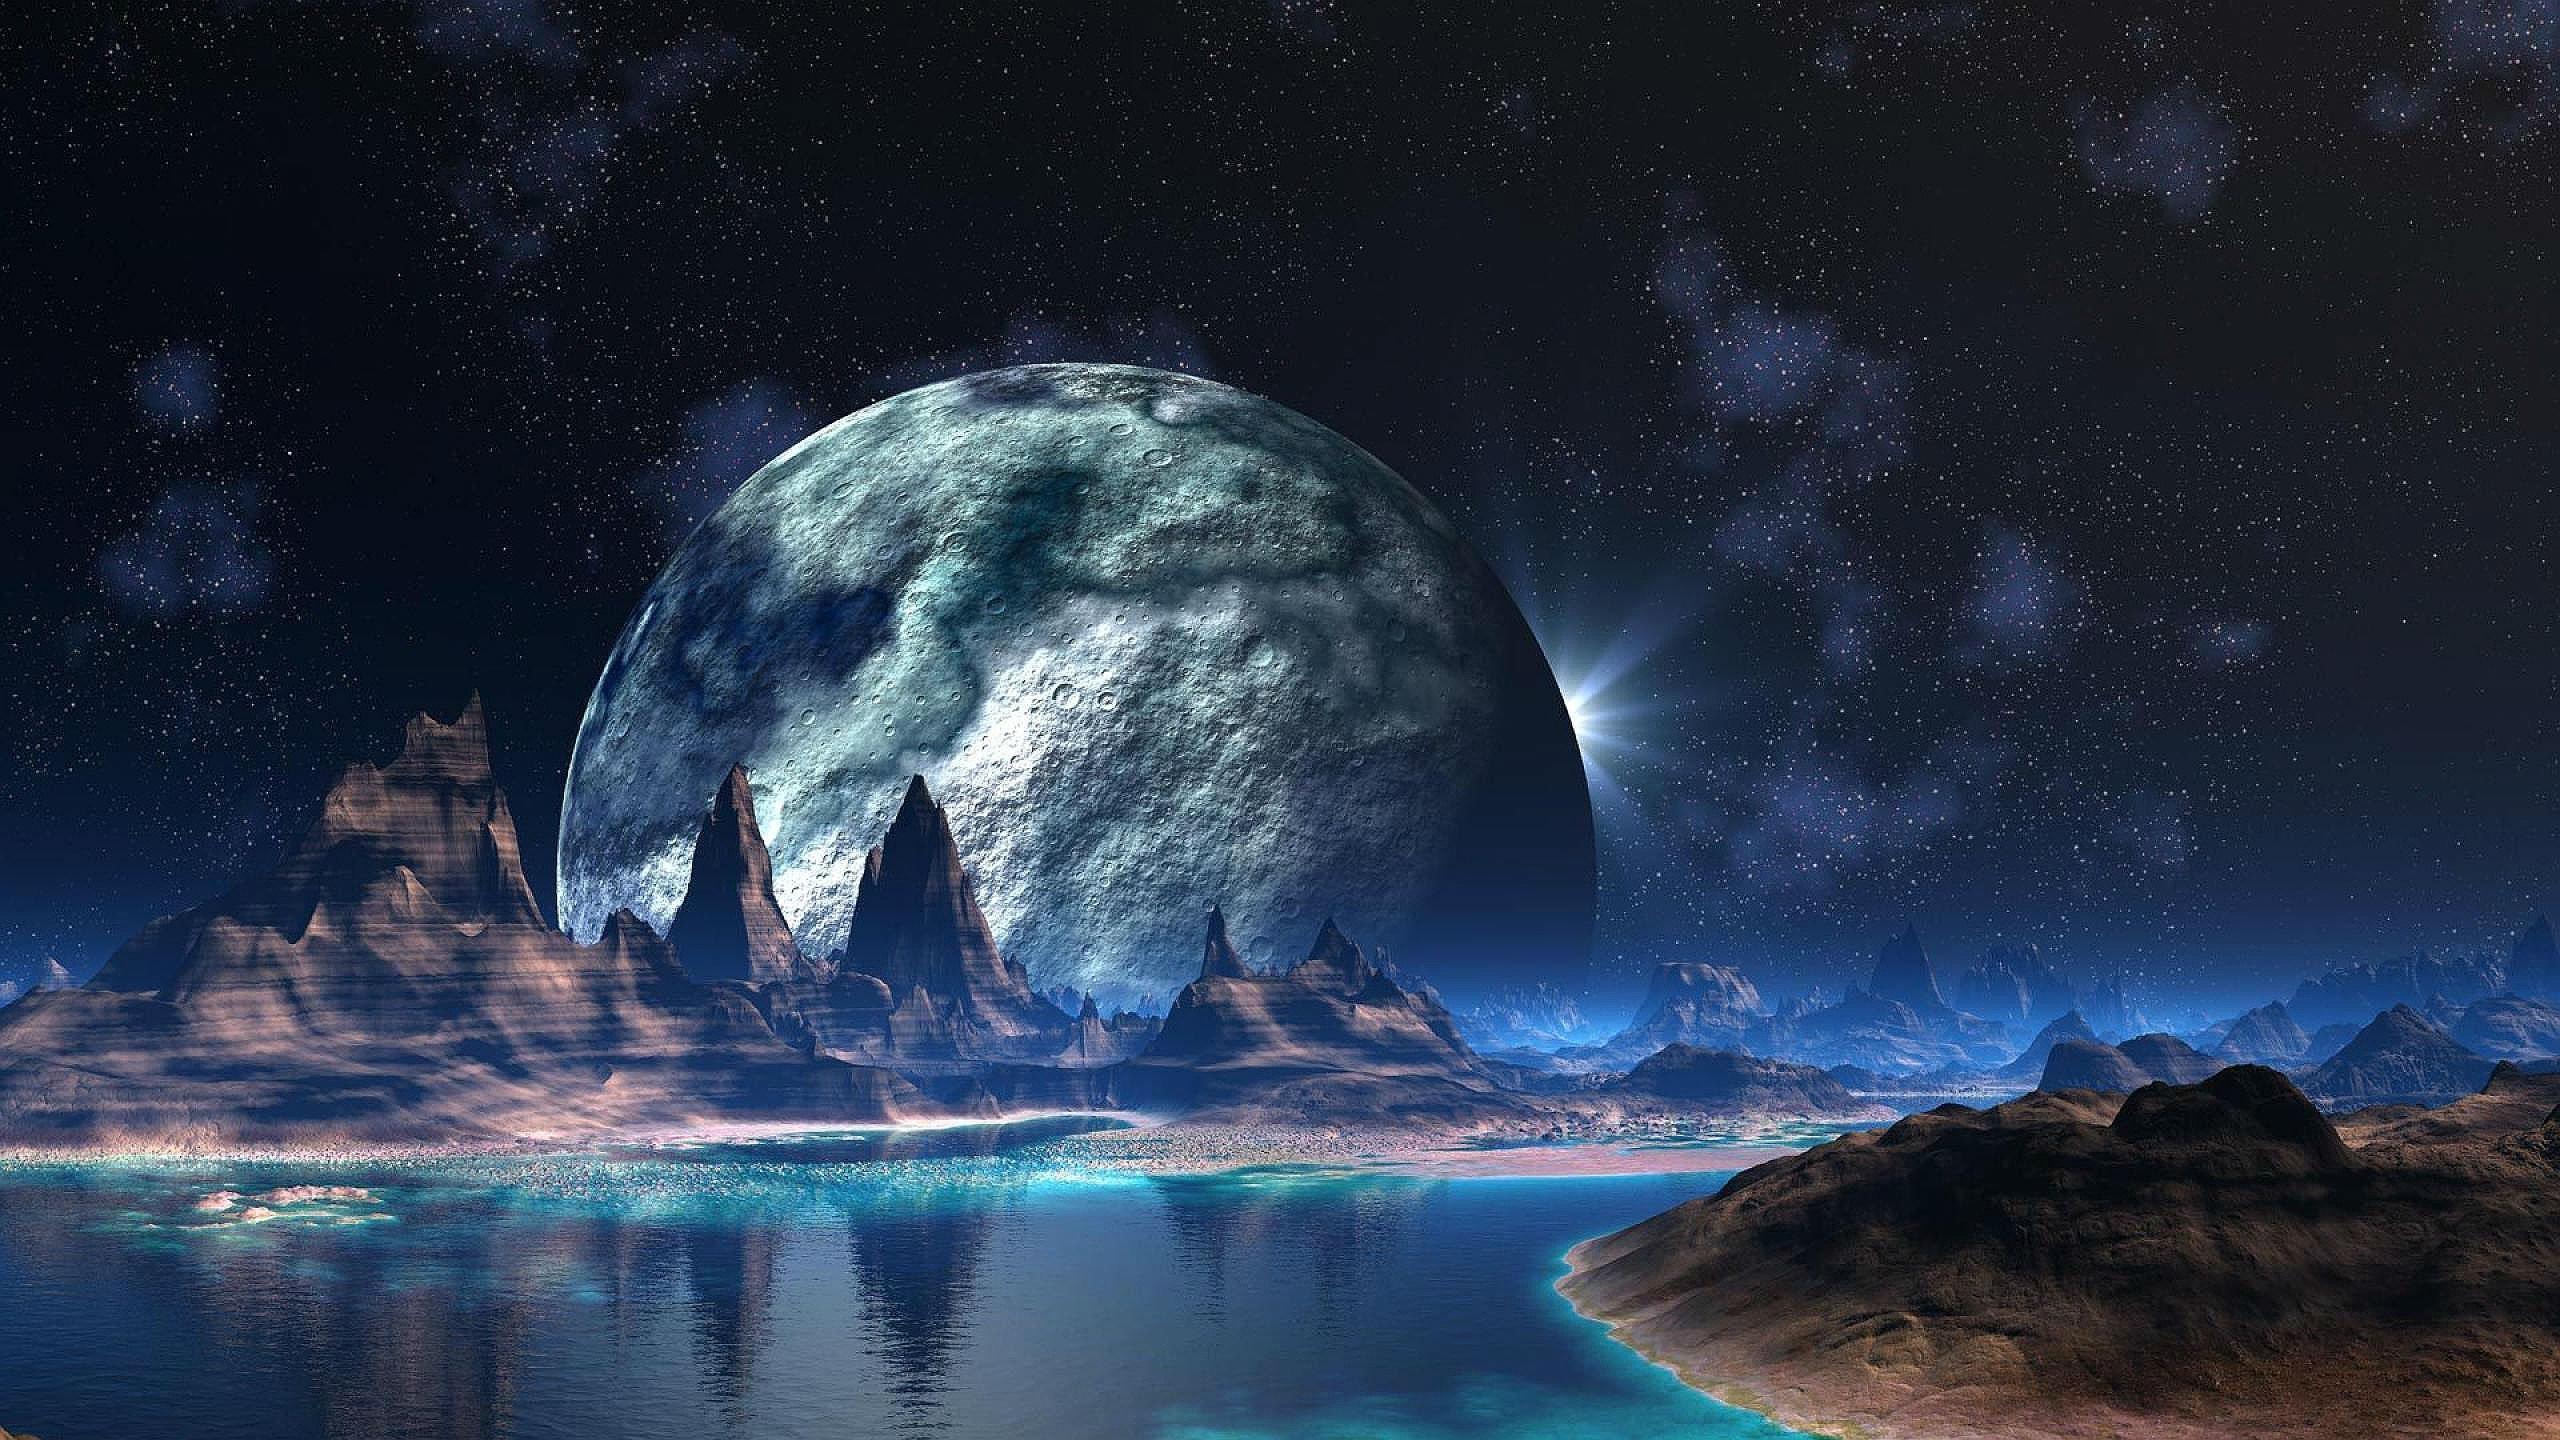 ALIEN horror sci-fi futuristic dark aliens creature survival landscape  planet wallpaper     809203   WallpaperUP